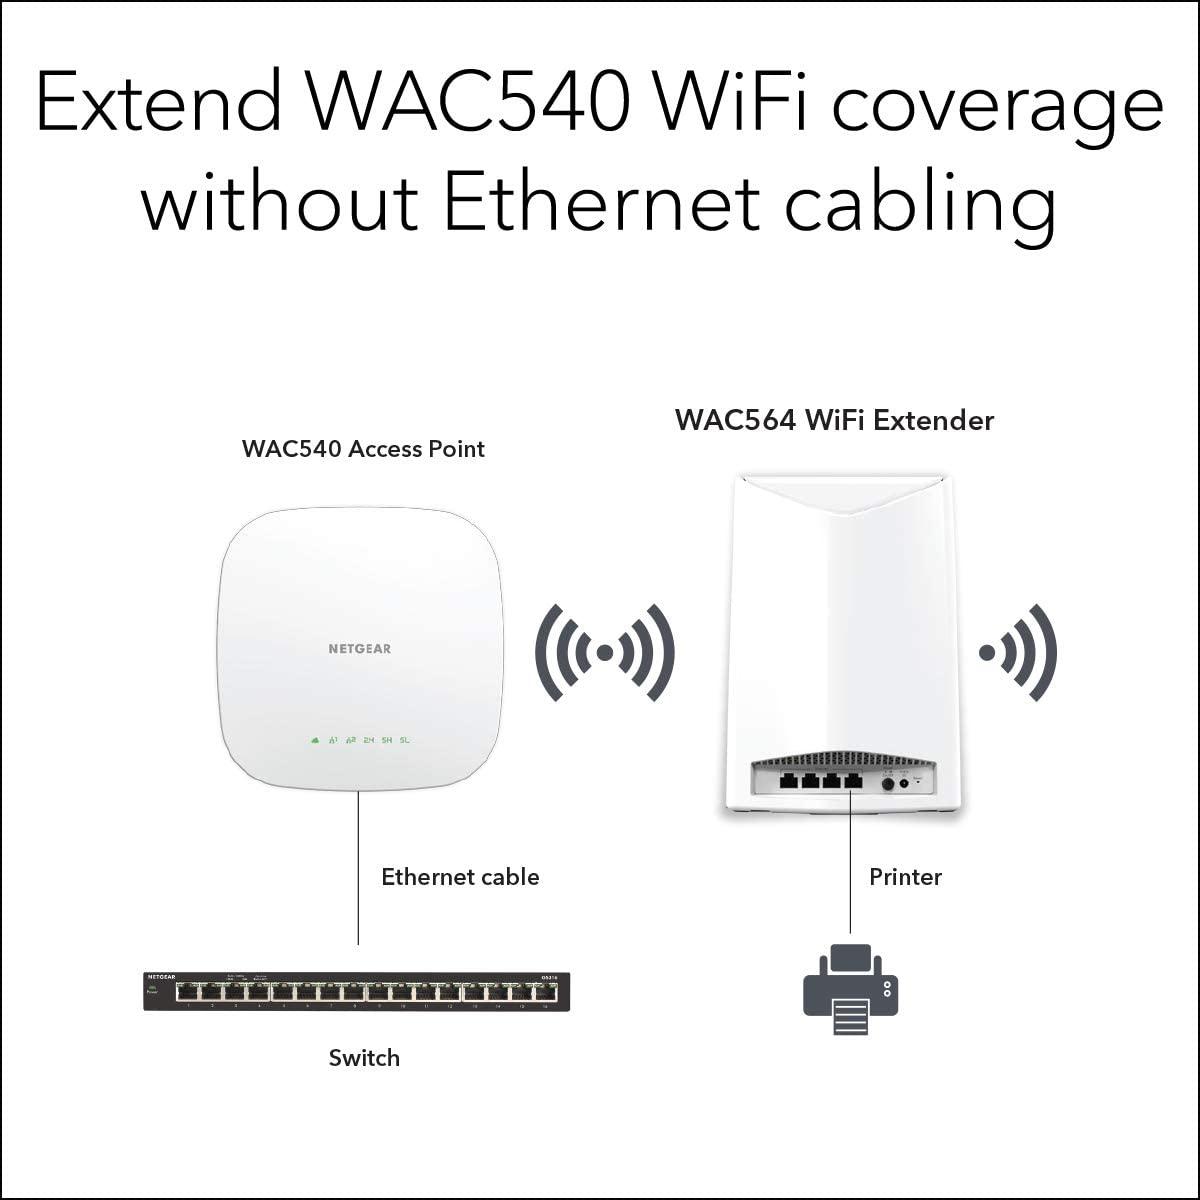 WAC564